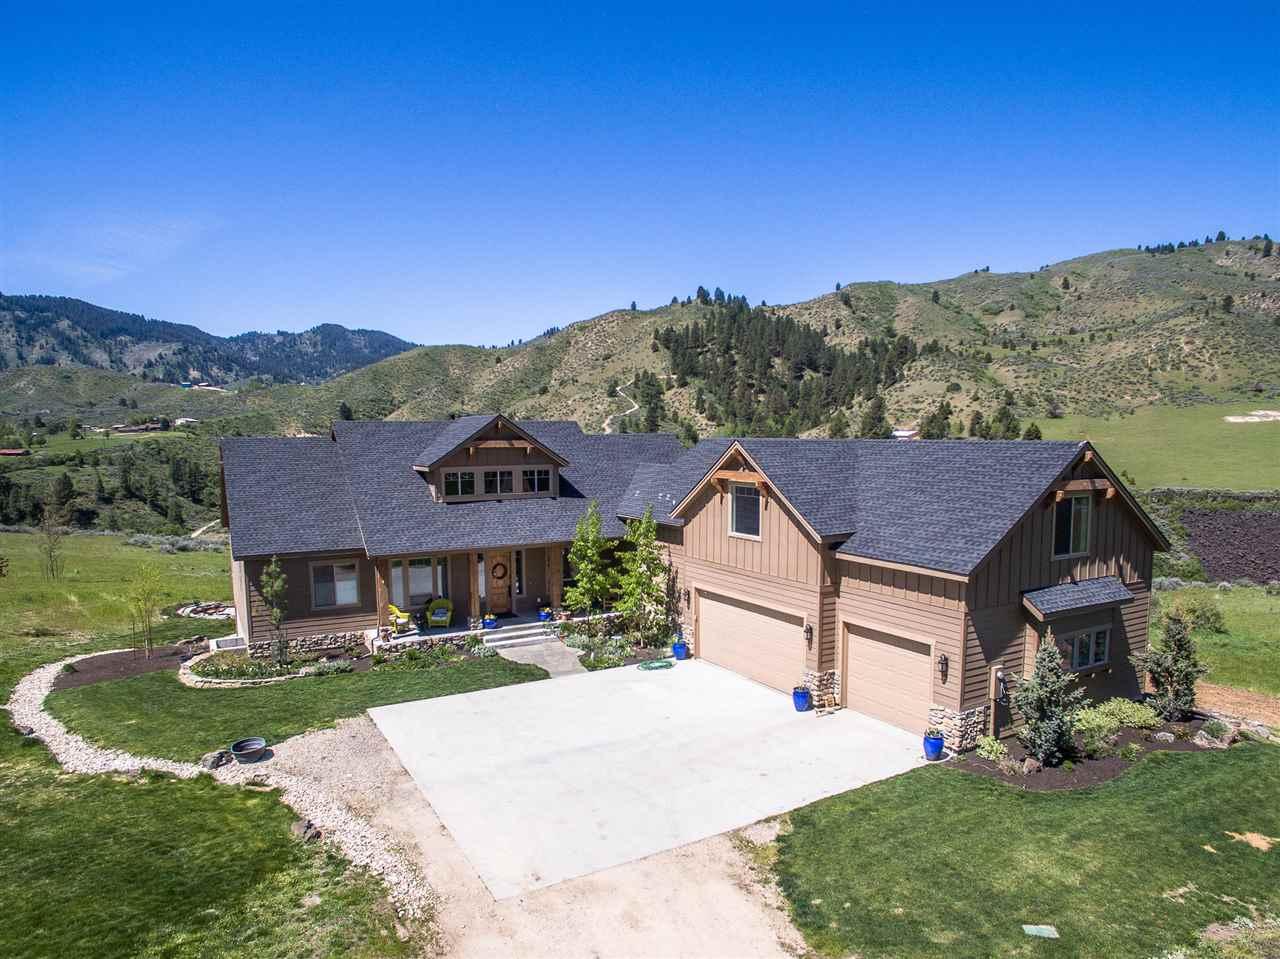 9 Creek View Drive, Boise, ID 83716